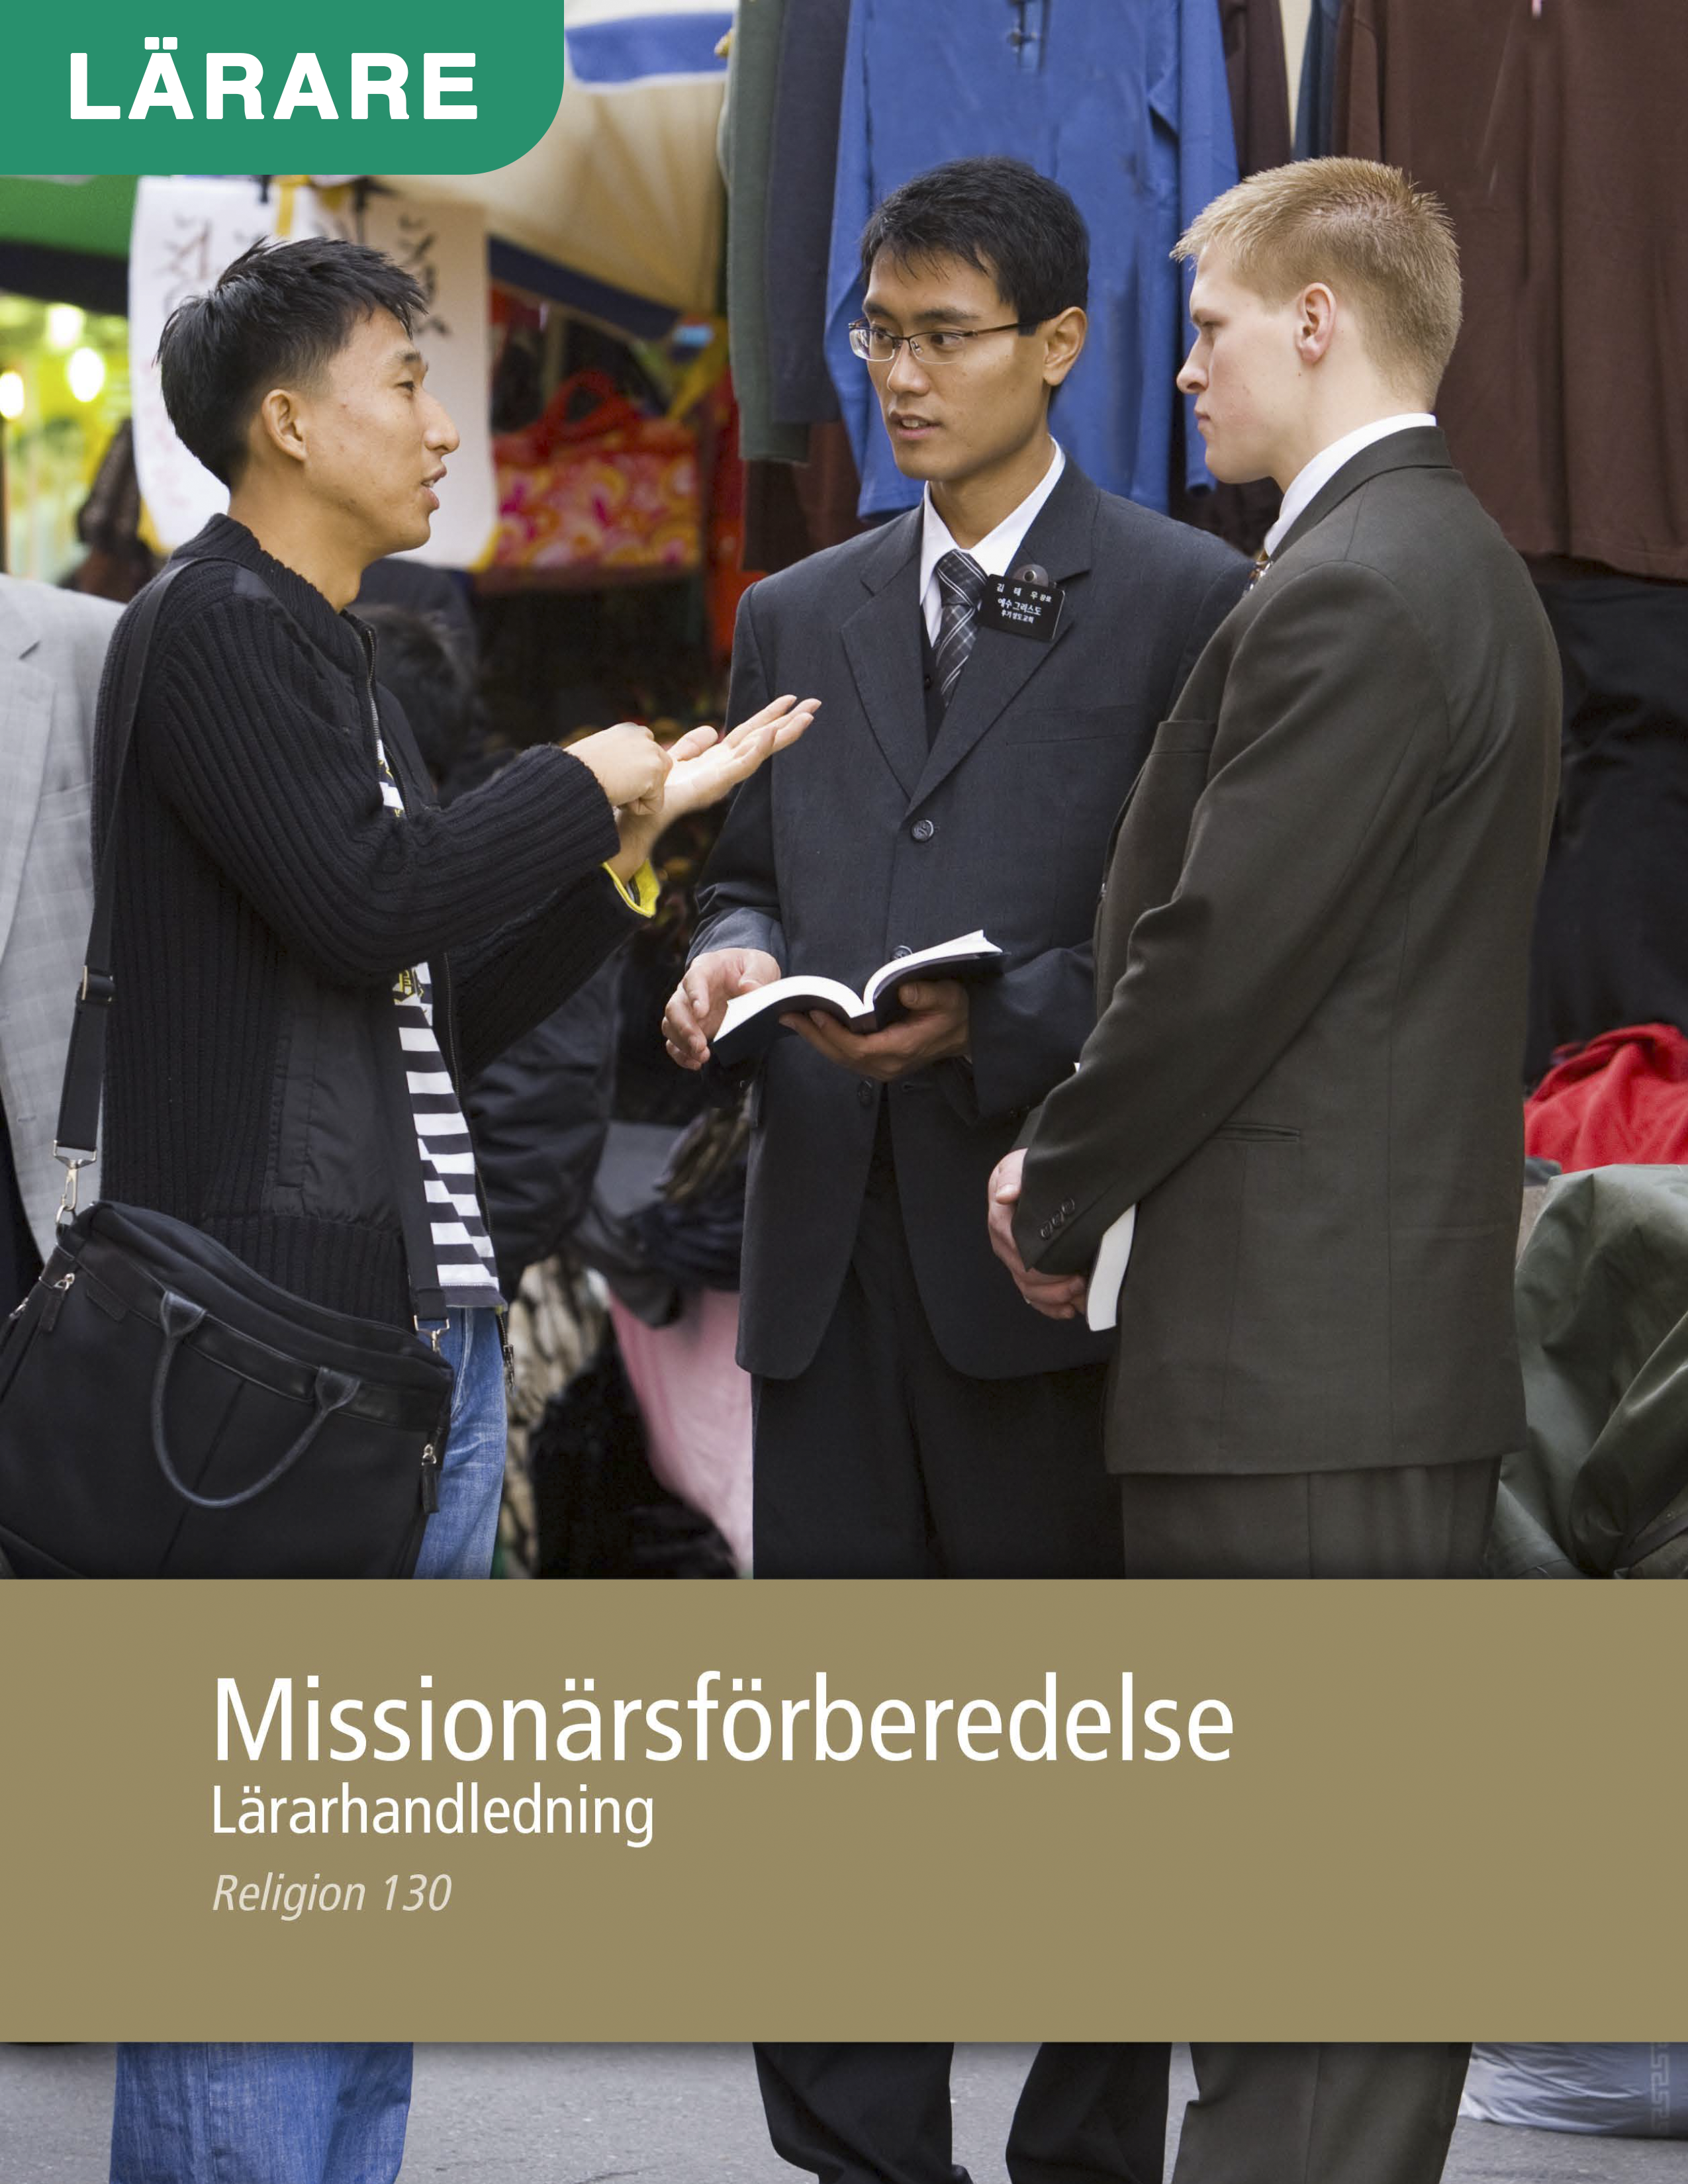 Missionärsförberedelse – Lärarhandledning (Religion 130)